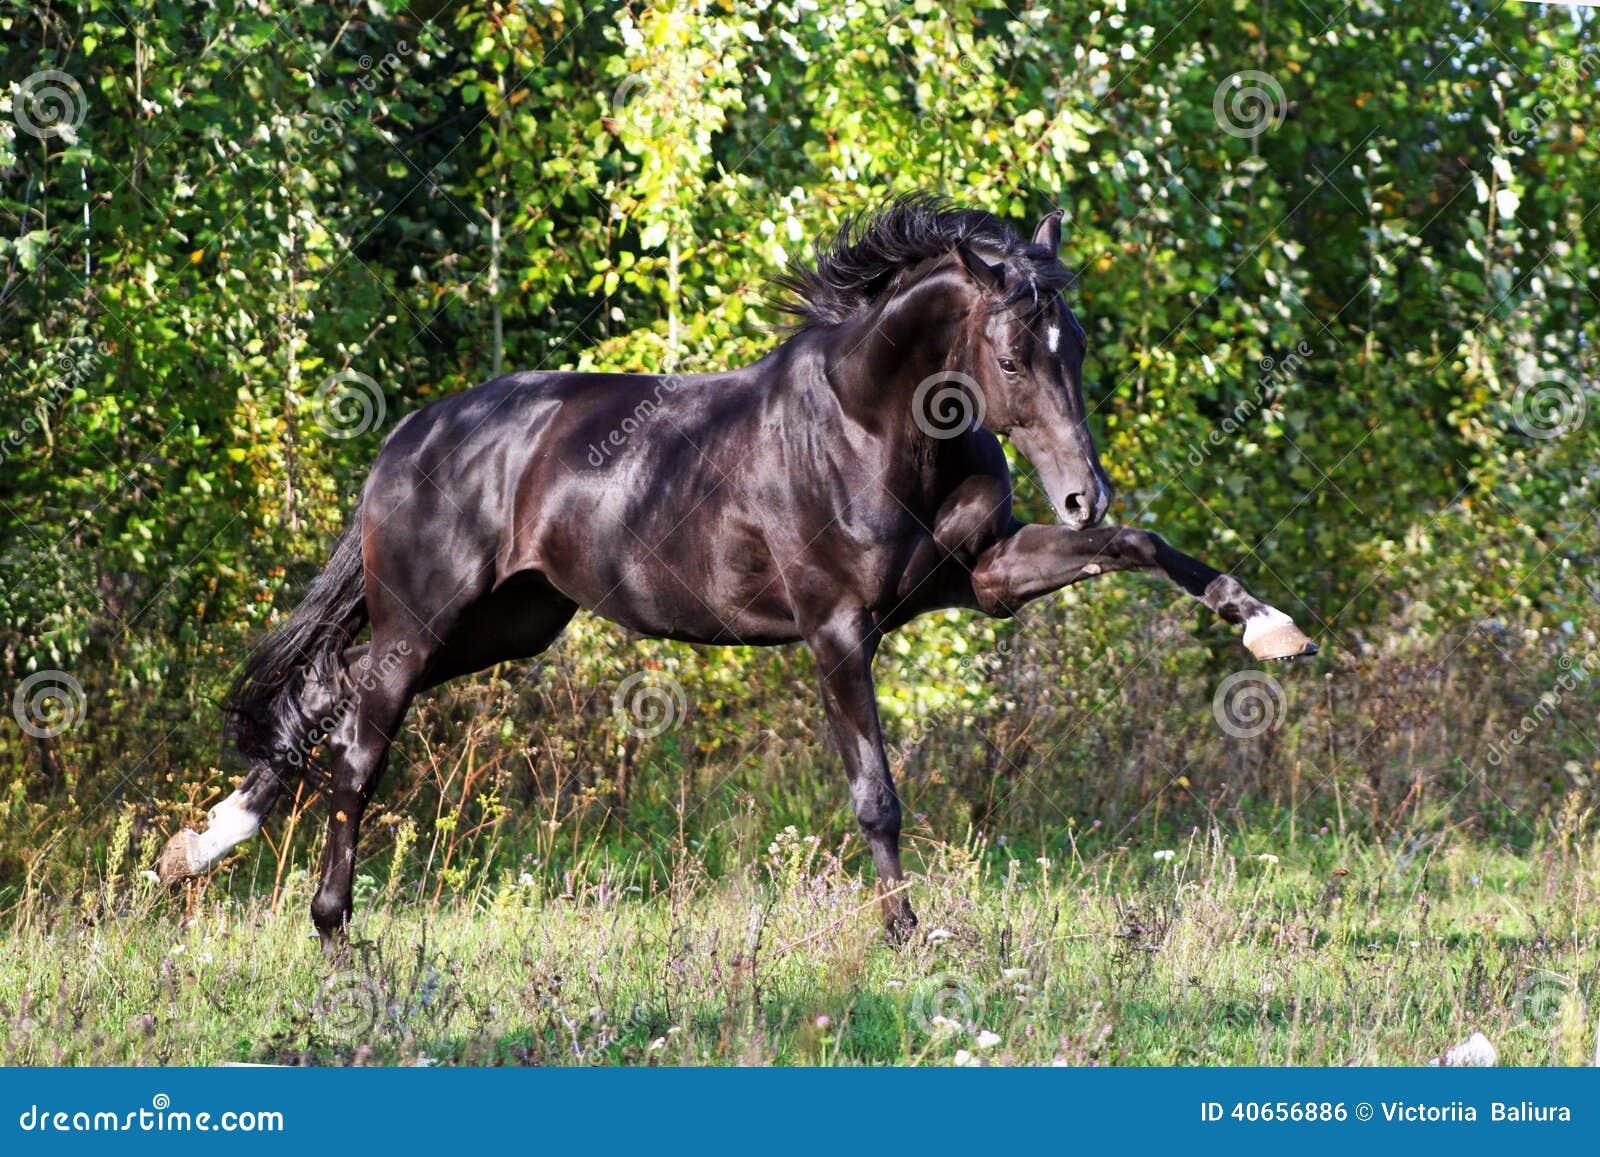 Ukrainian Horse Breed Horses Stock Photo Image 40656886